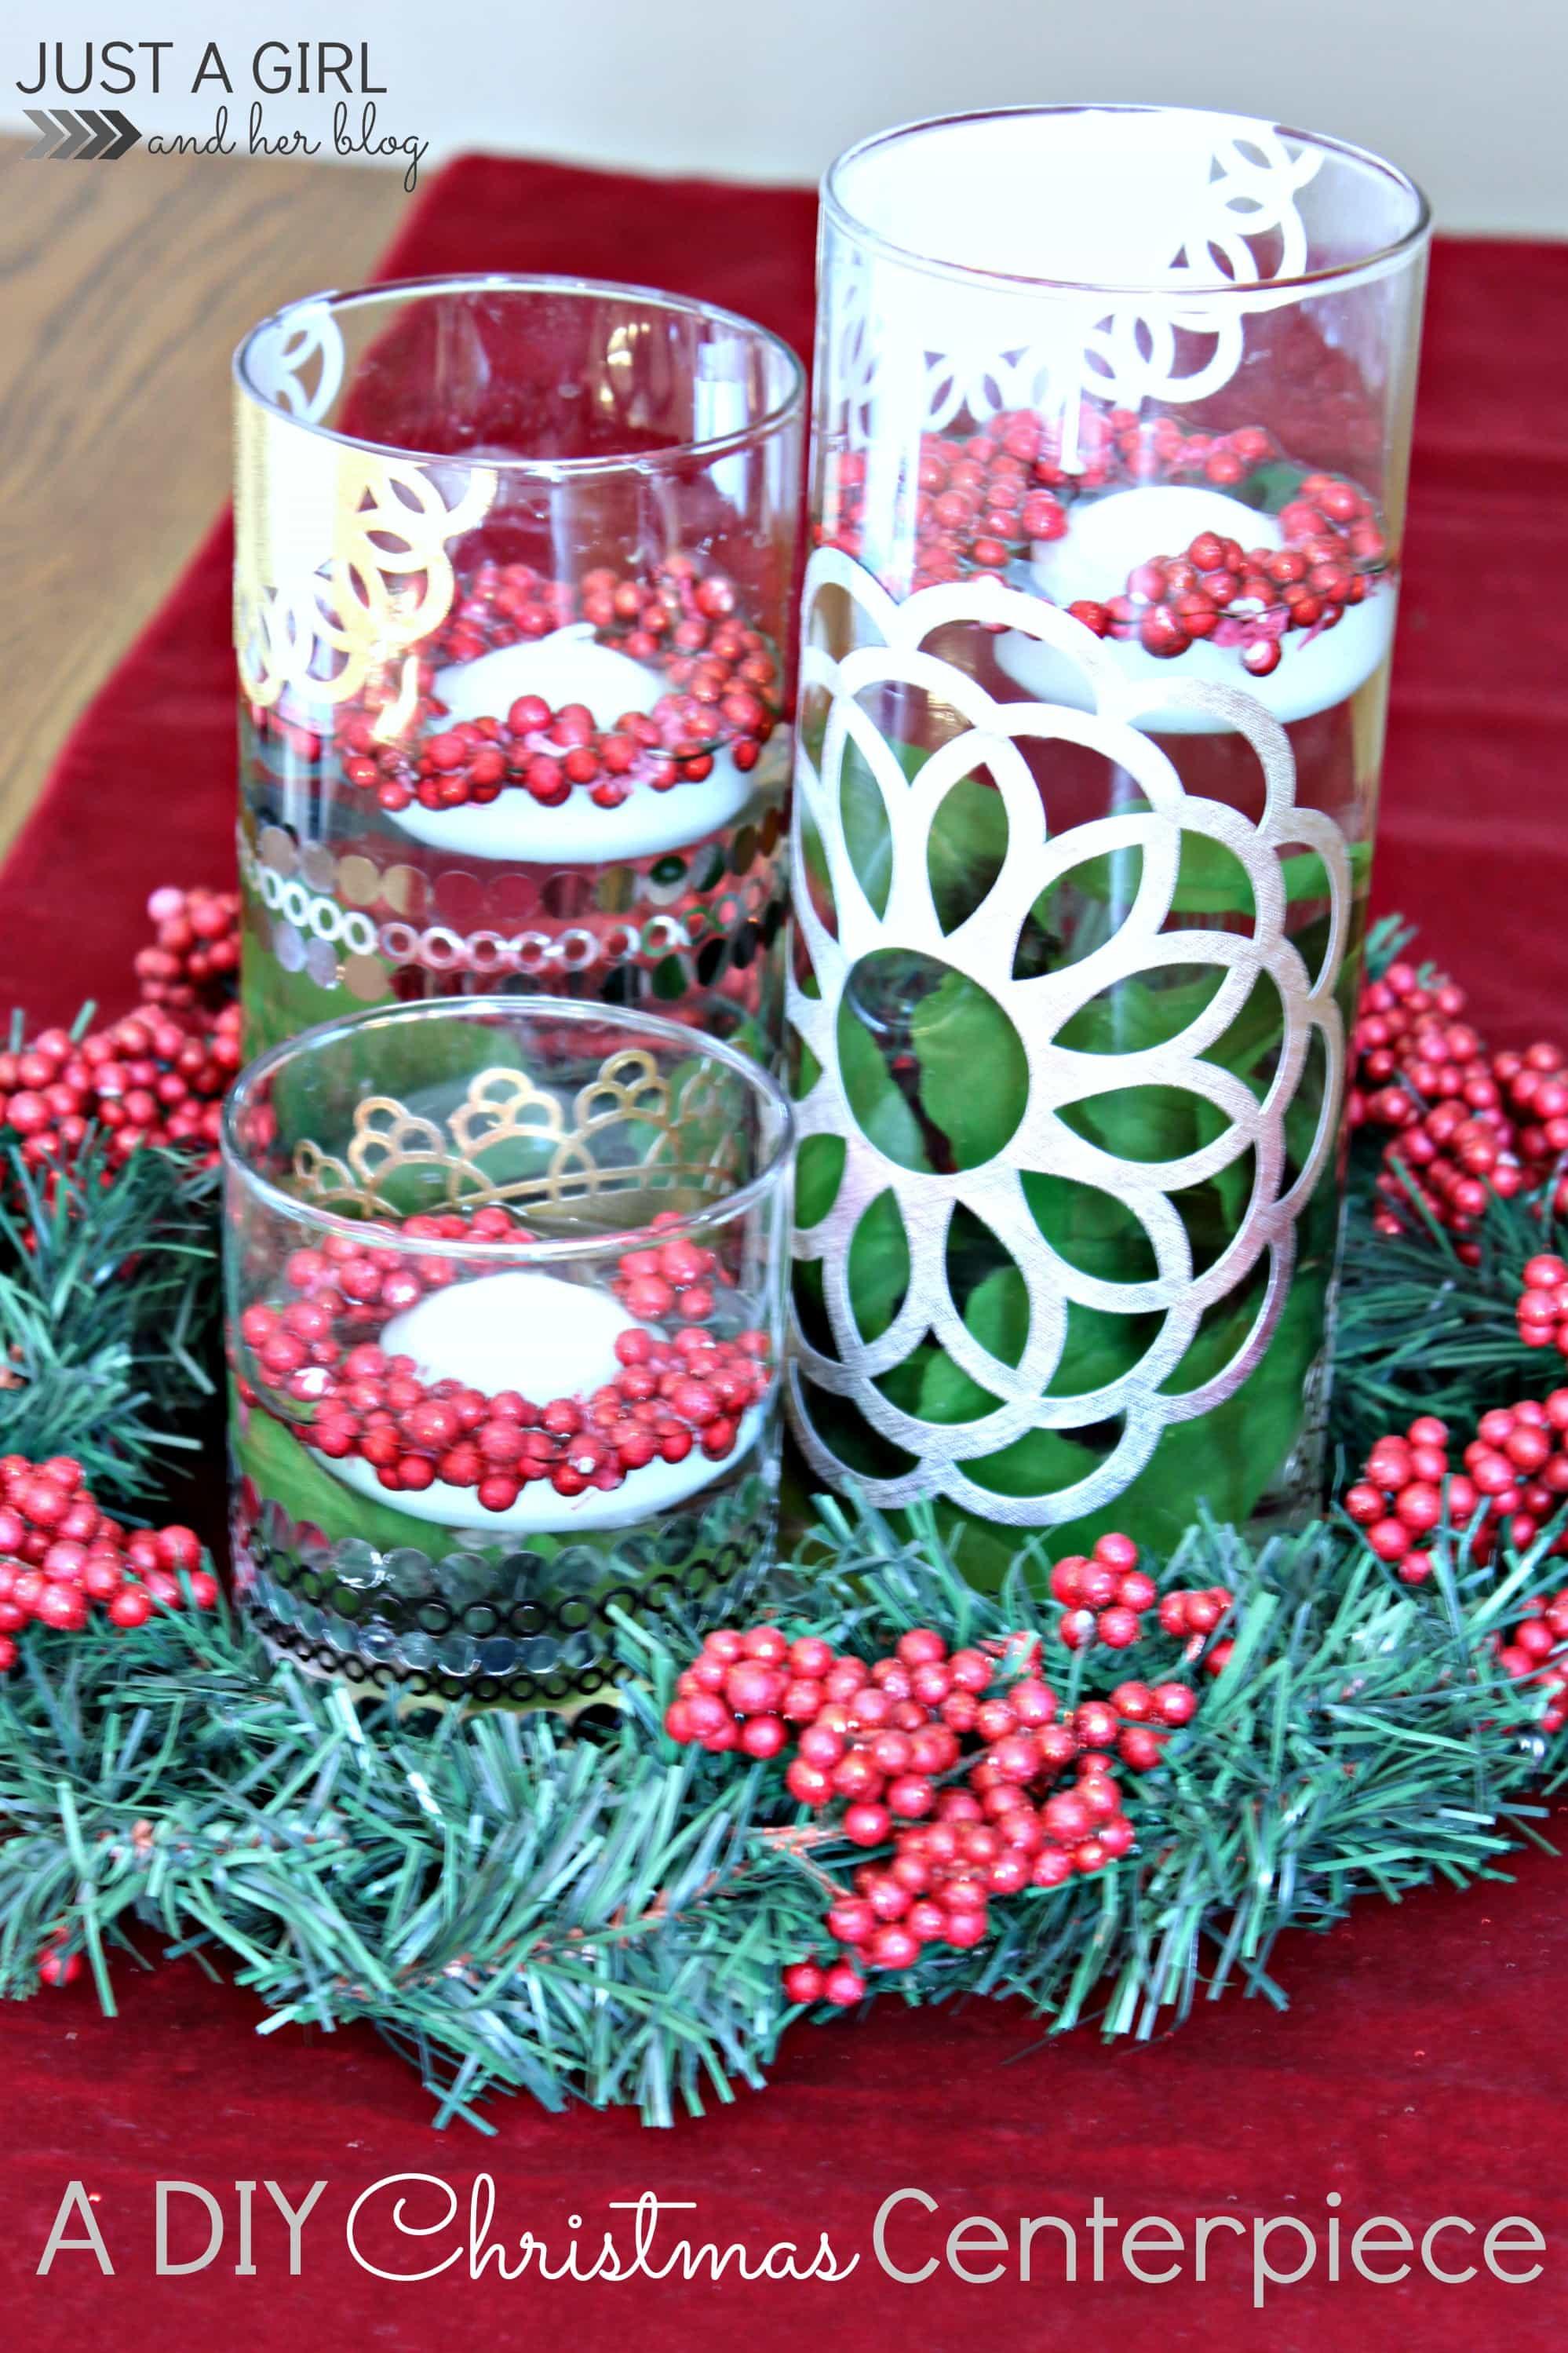 Best ideas about Christmas Centerpiece DIY . Save or Pin A DIY Christmas Centerpiece with Martha Stewart Crafts Now.